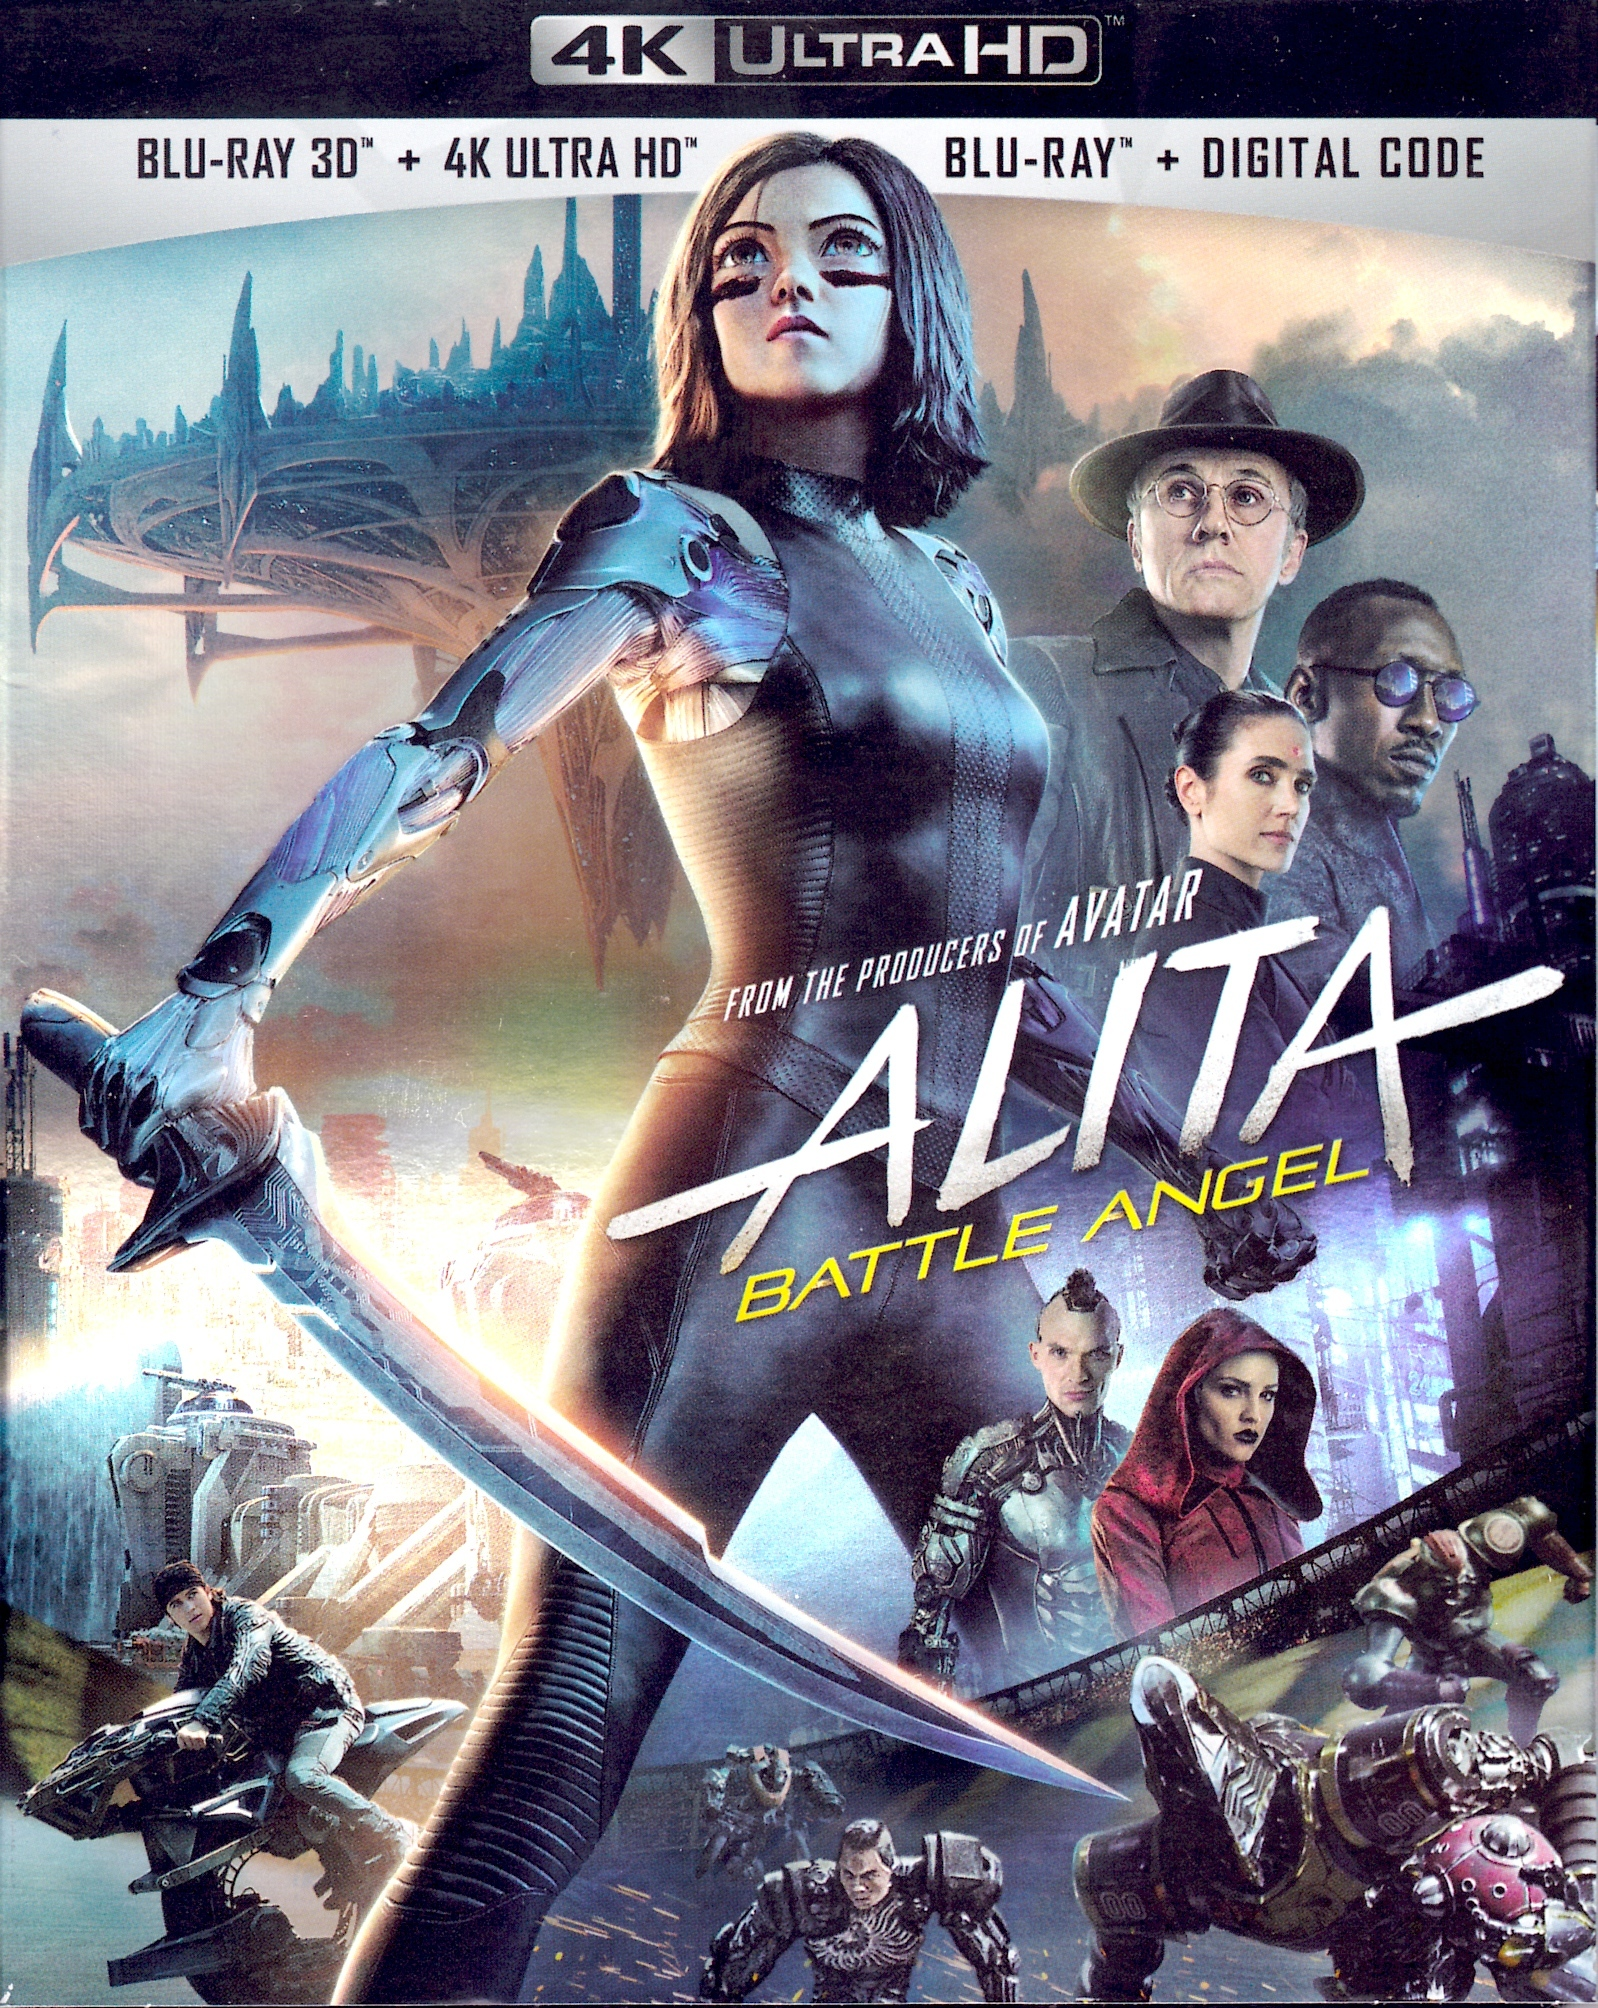 Alita: Battle Angel (4K Ultra HD Blu-ray)(Pre-order / TBA)